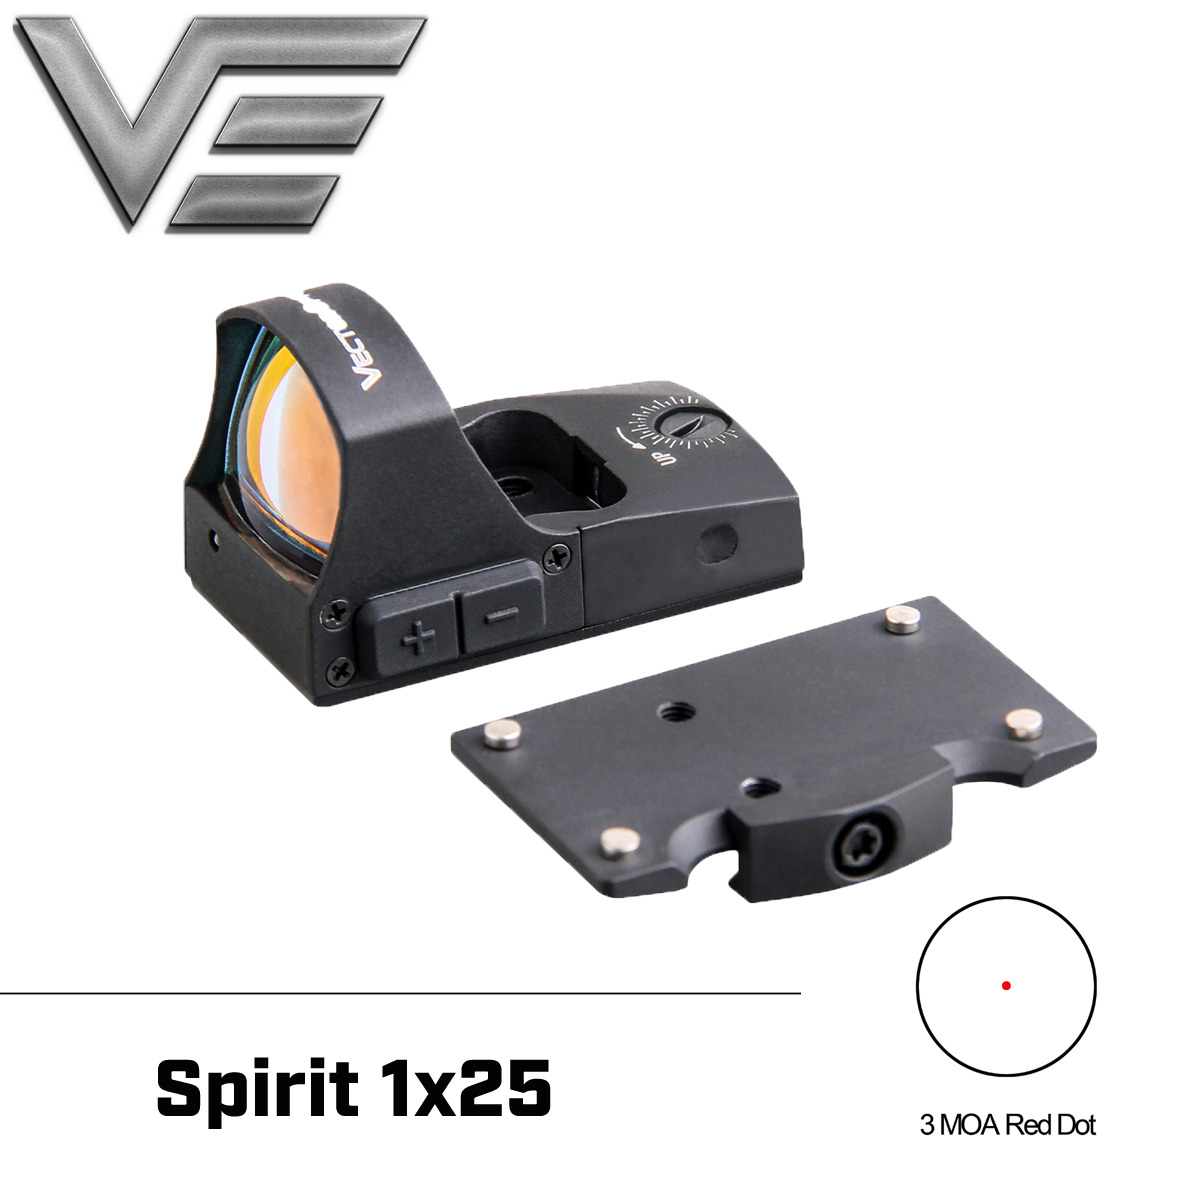 Vector Optics Spirit 1x25 Mini Auto Light Sense Red Dot Sight Scope Mini Pistol On/off Switch Fit For 21mm Picatinny GLOCK 17 19